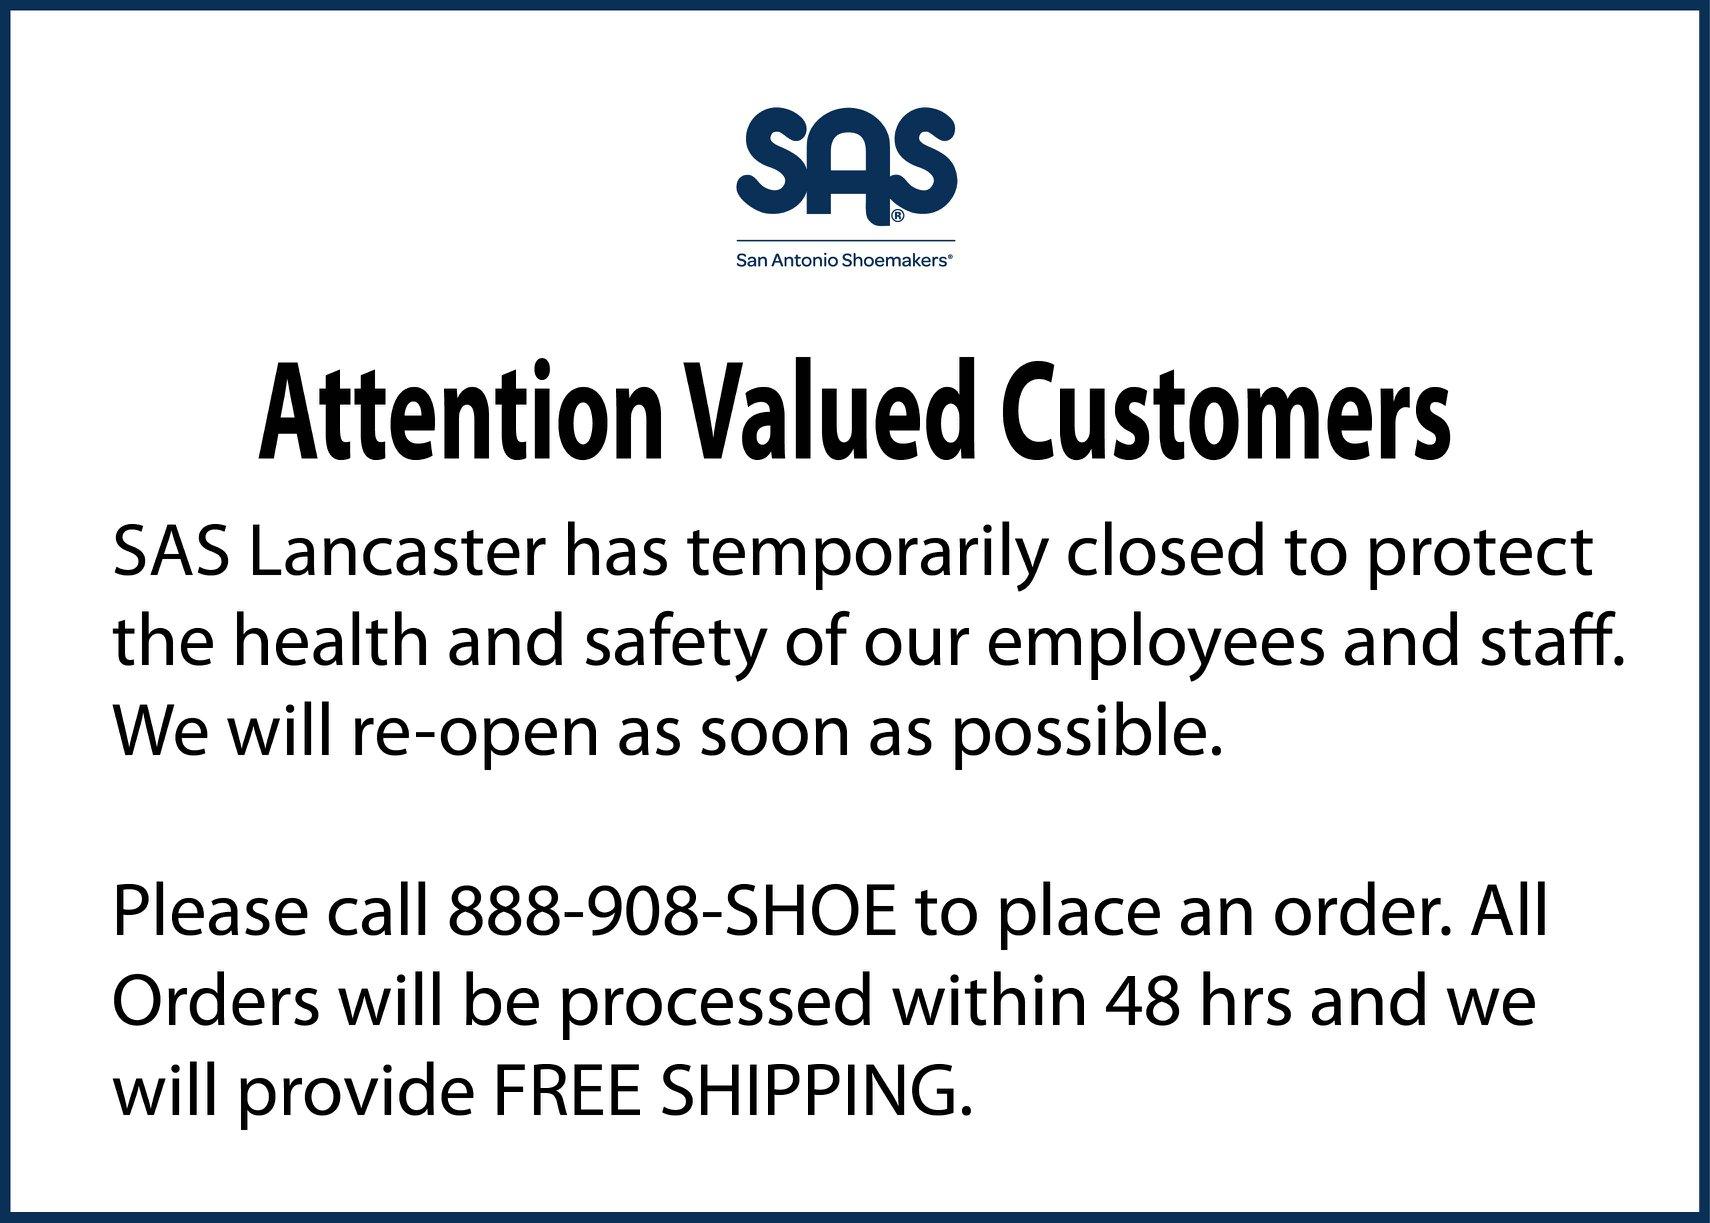 SAS Shoes 1265 Stanley K Tanger Dr, Lancaster